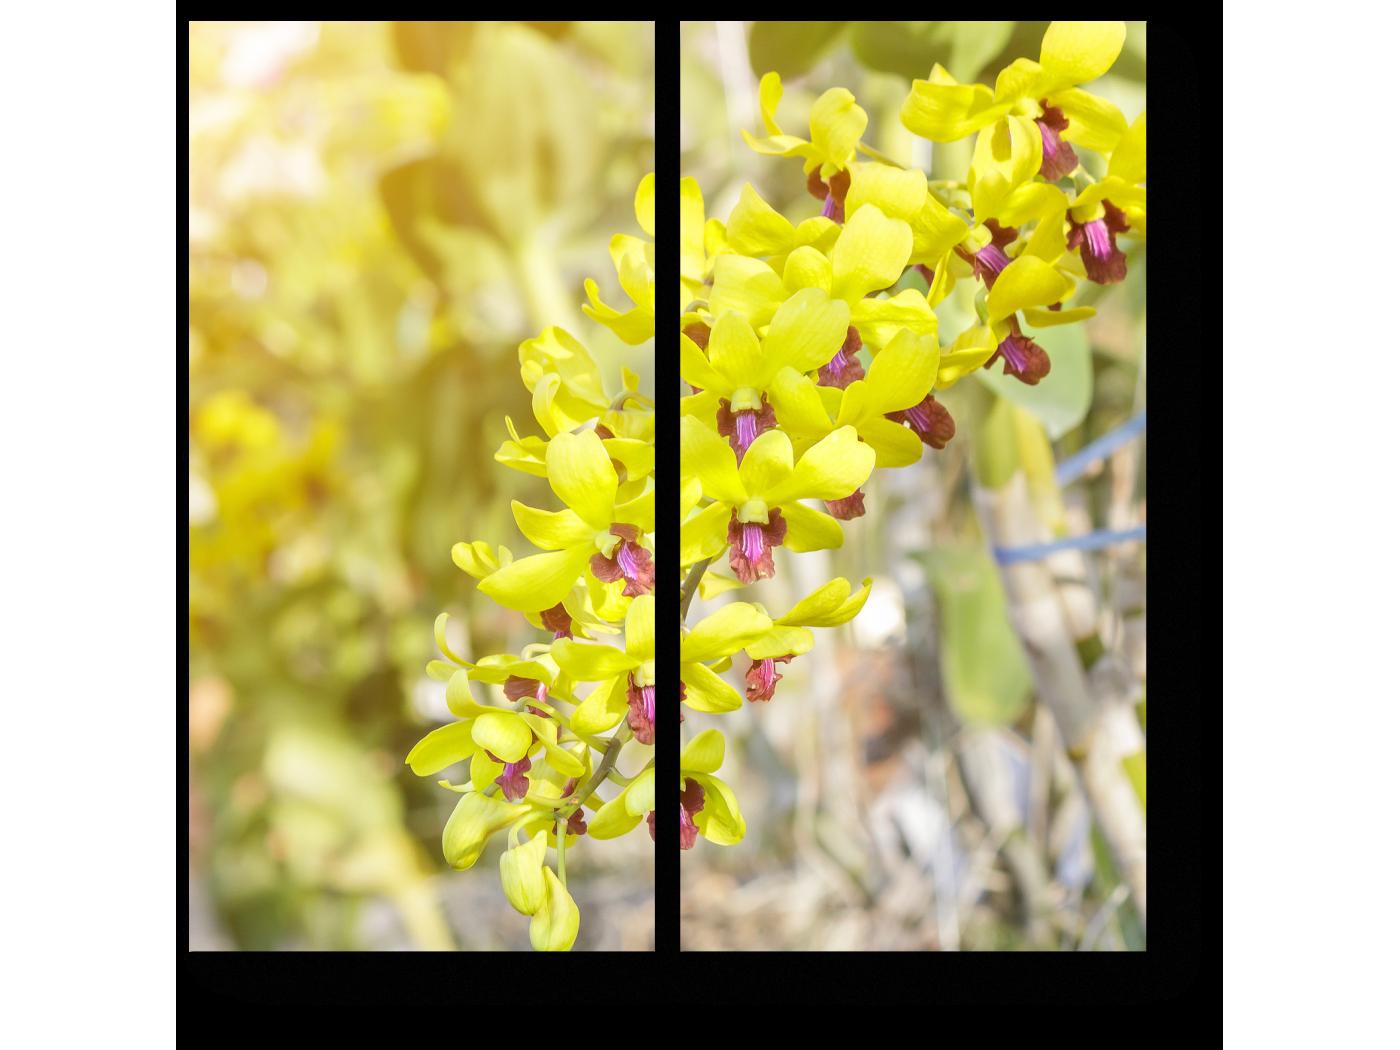 Модульная картина Цветок Таиланда (40x40) фото